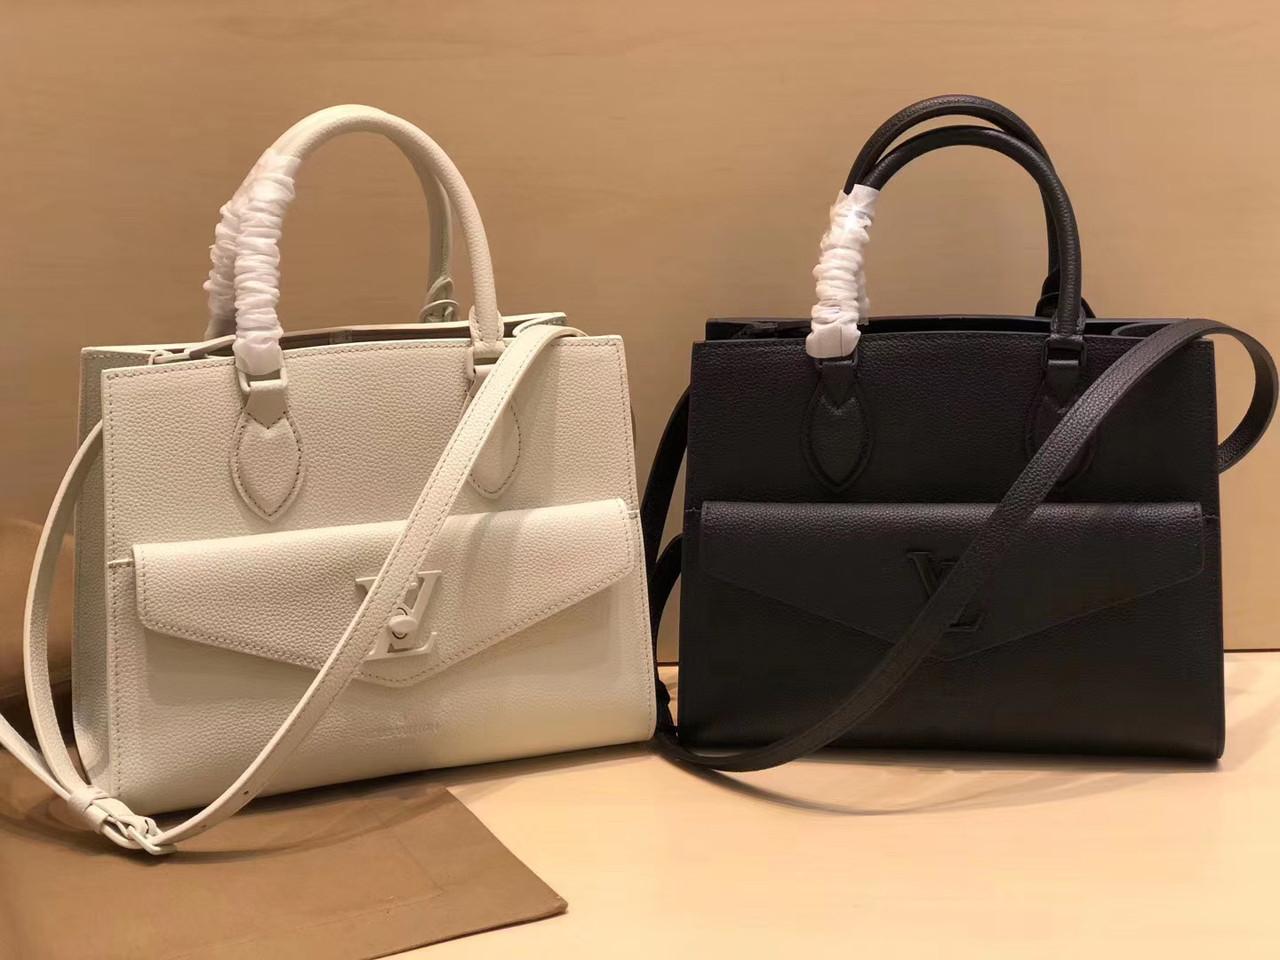 Сумка Louis Vuitton жіноча